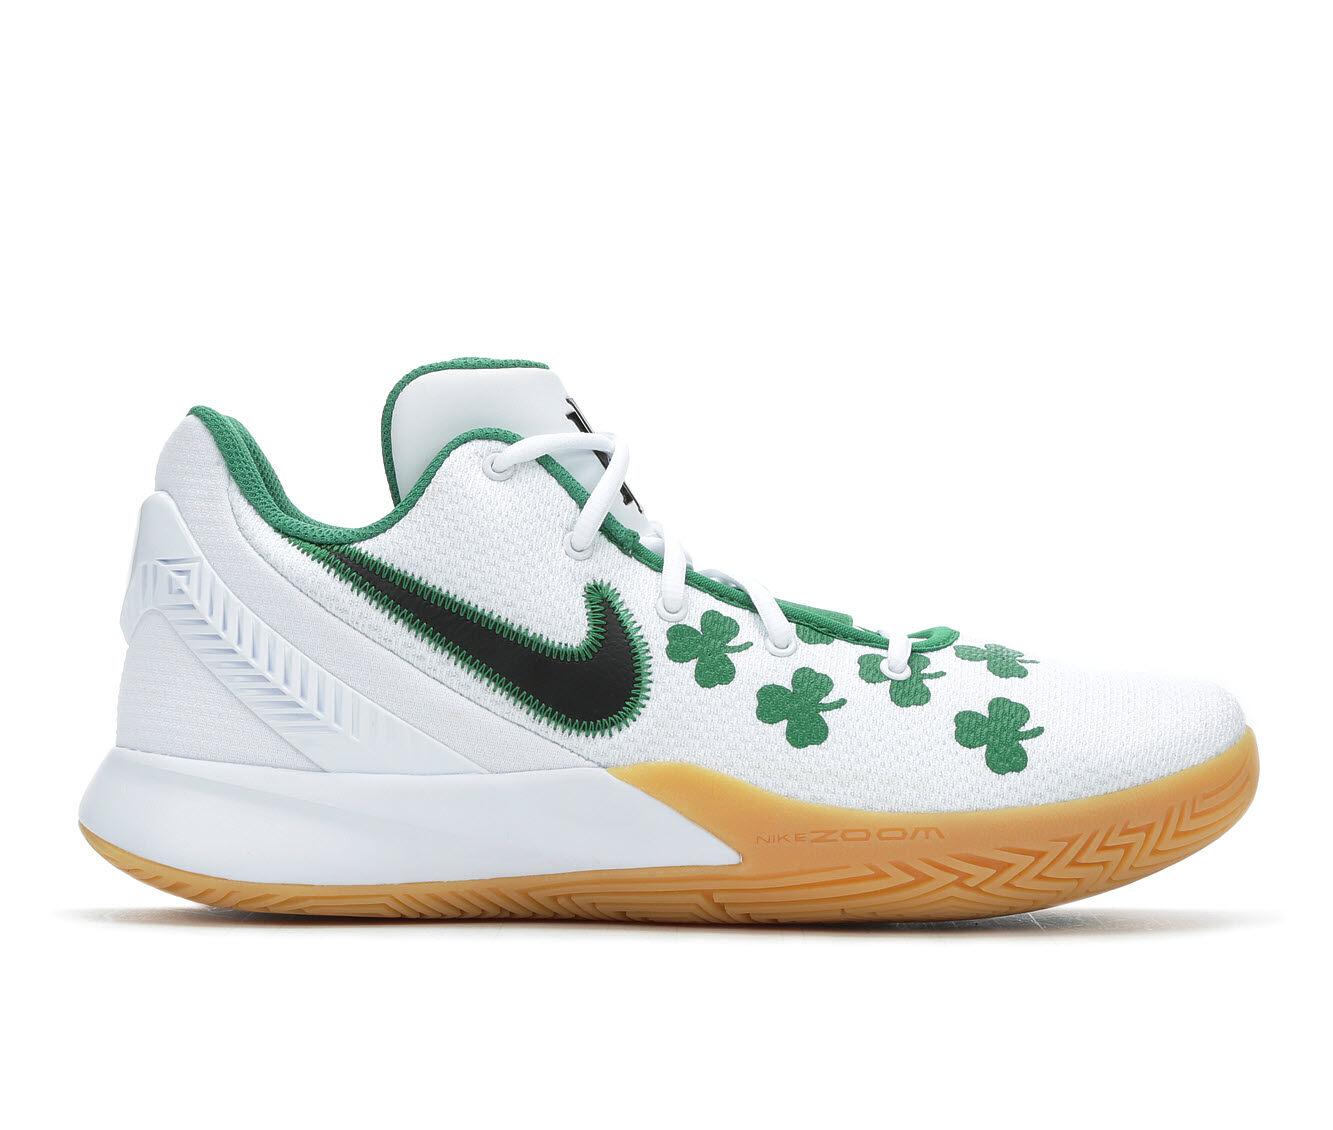 Men's Nike Kyrie Flytrap II Basketball Shoes Wht/Grn/Gld 100